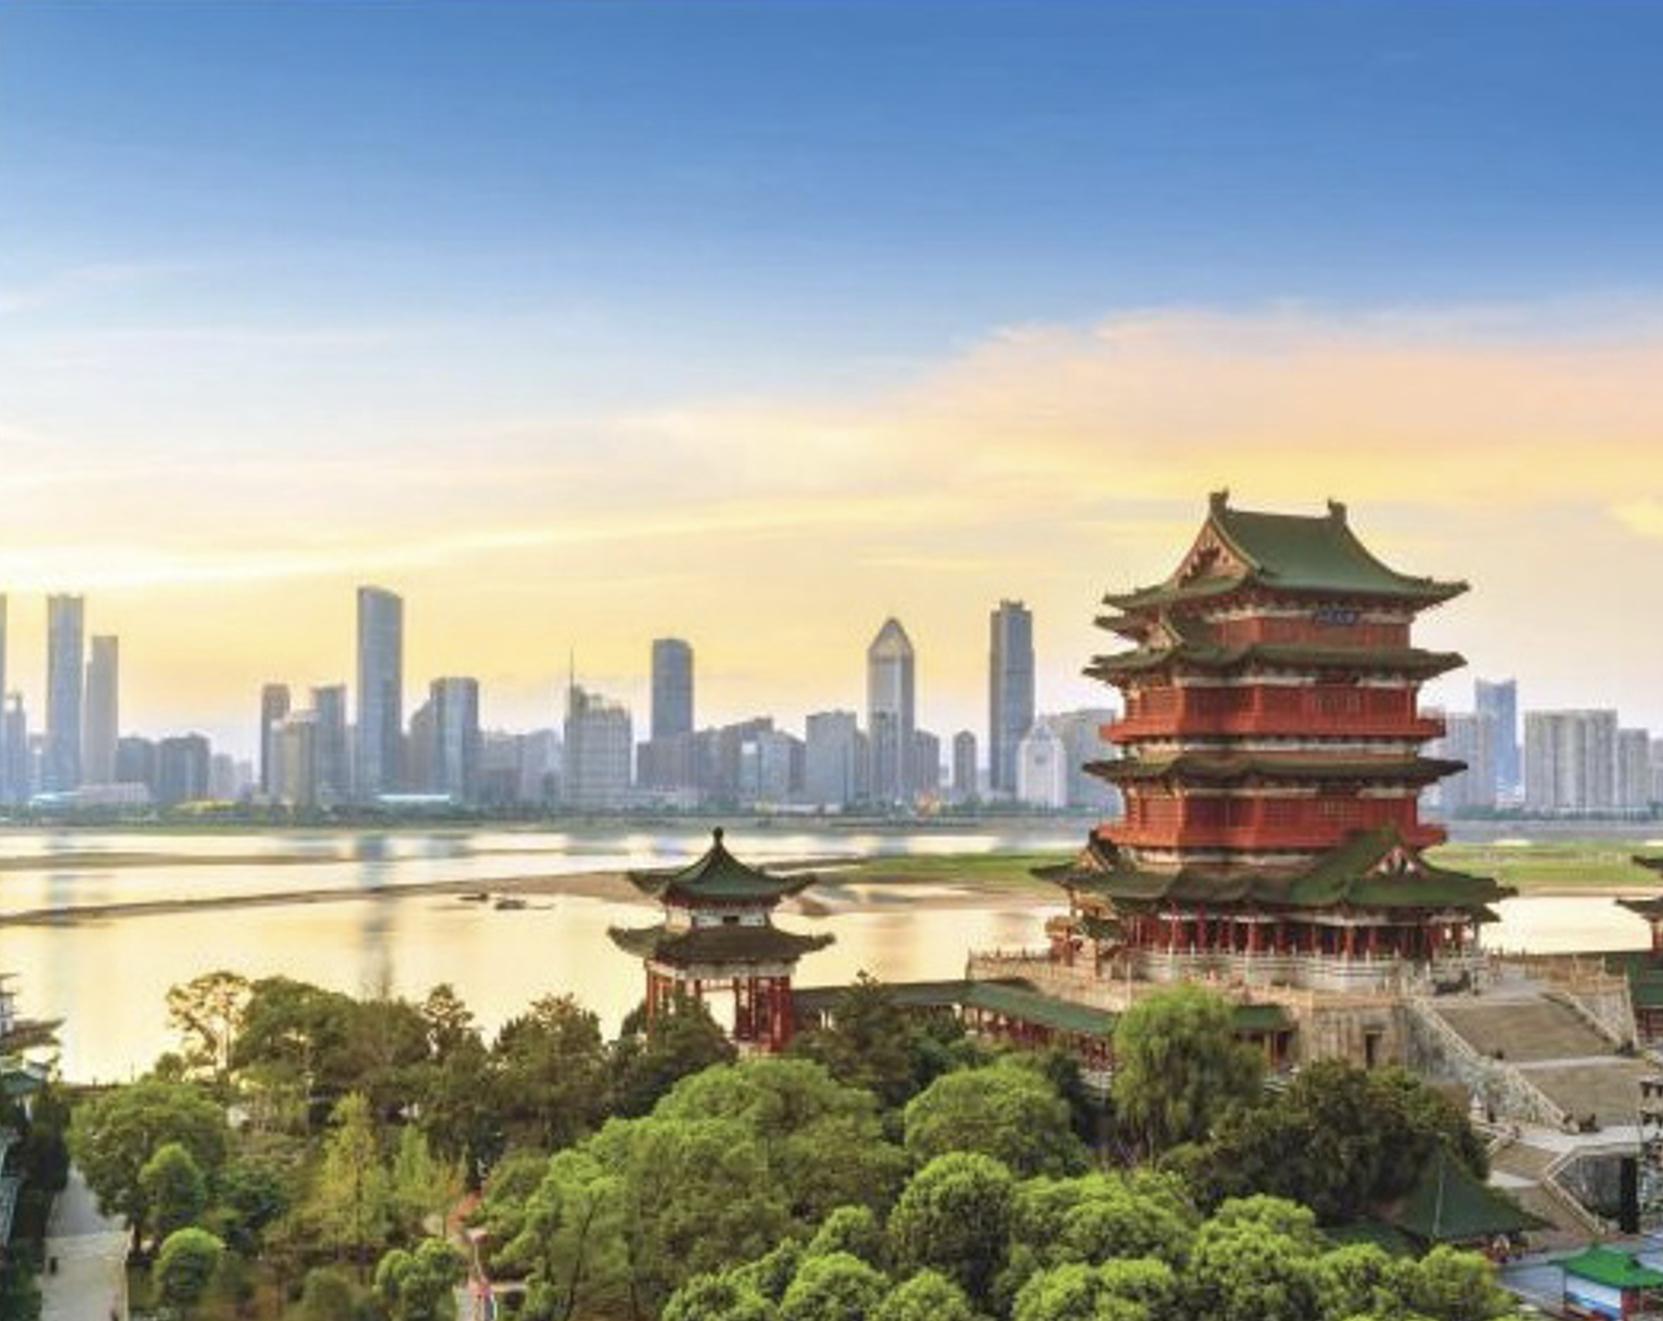 Parliamo di Cina